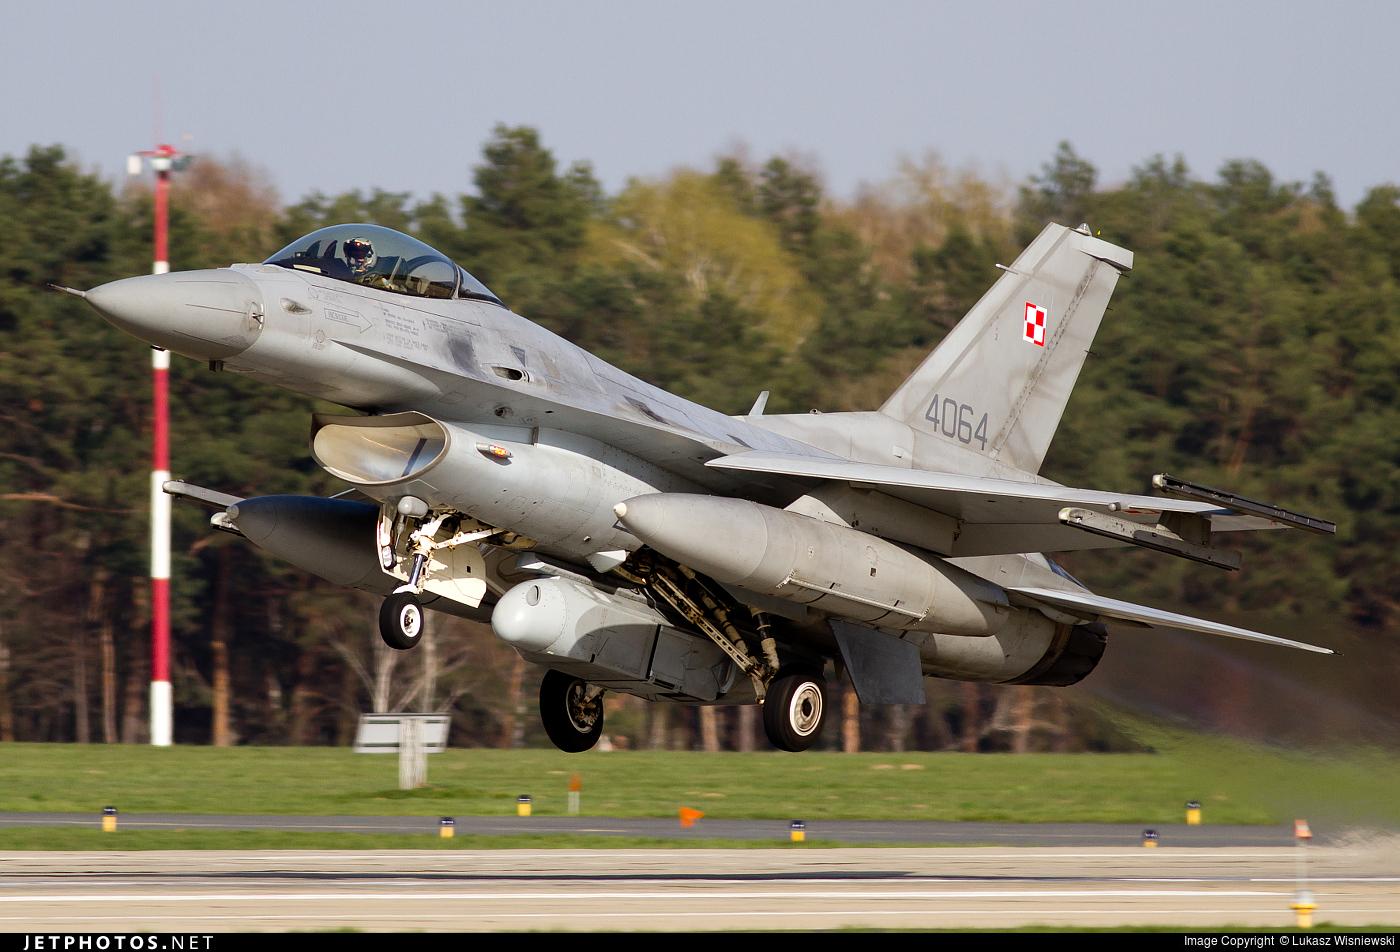 4064 - Lockheed Martin F-16C Fighting Falcon - Poland - Air Force